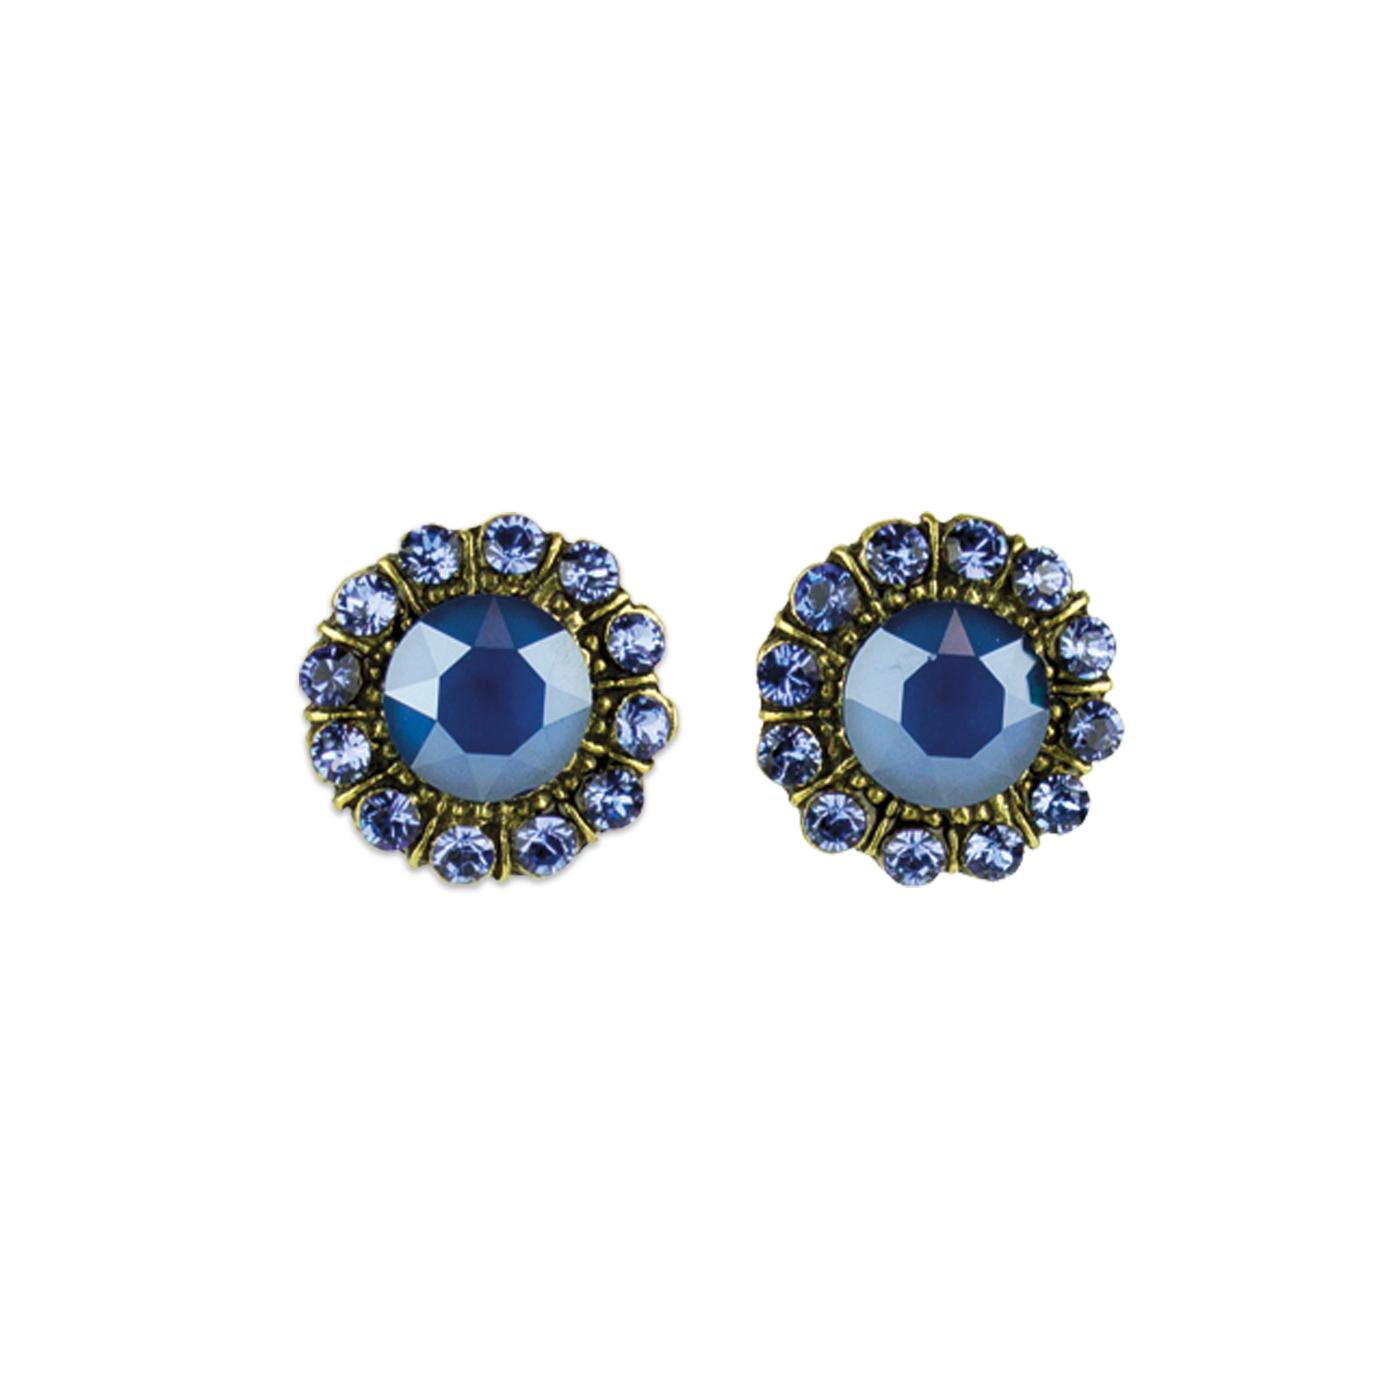 Livie Princess Earrings | Anne Koplik Designs Jewelry | Vintage Inspired Jewelry Handcrafted in America with Crystals from Swarovski®